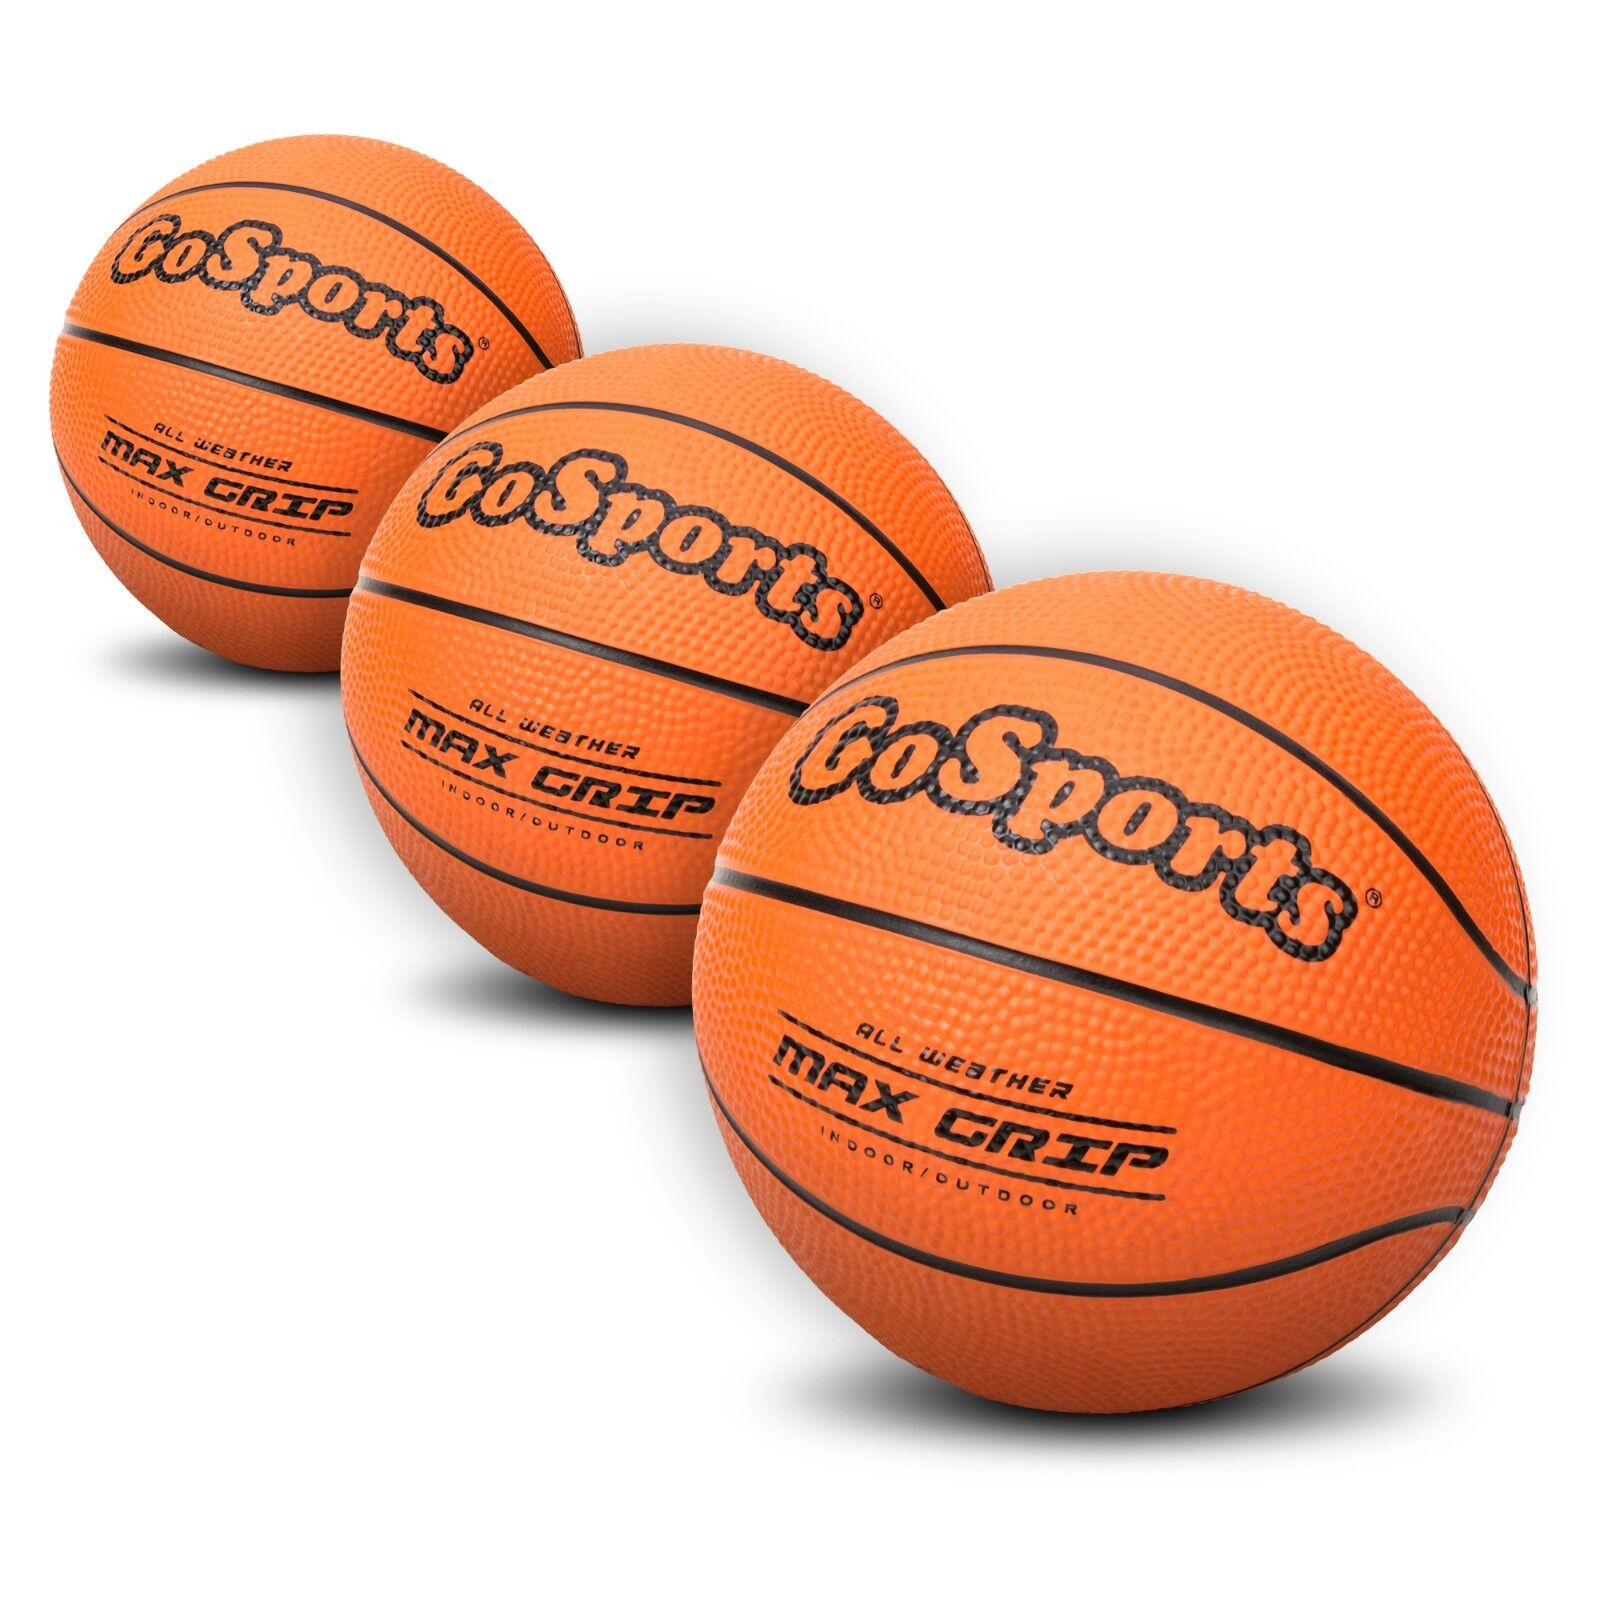 mini basketballs gosports 5 inch mini basketball 3 pack premium pump included - Basketball Display Case